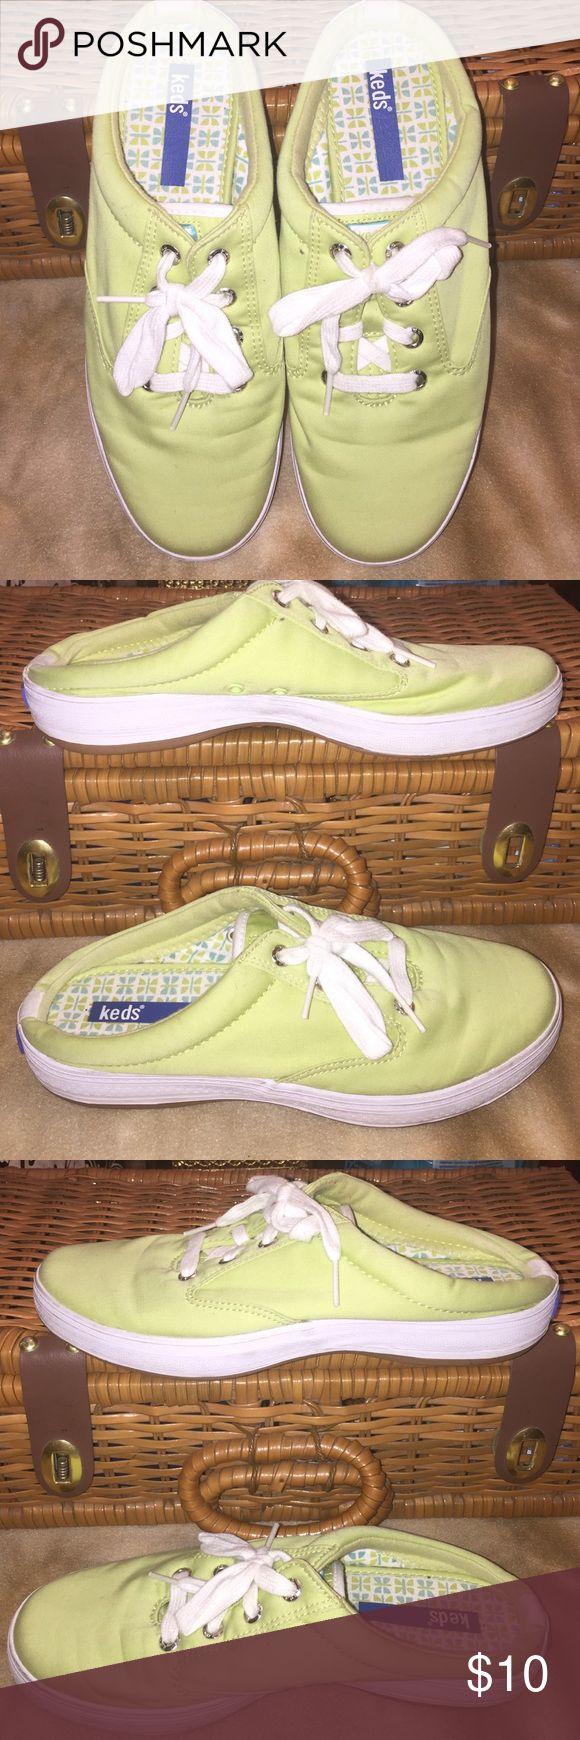 Kiwi Keds Slip Ons Size 6.5 EUC very clean. Keds Shoes Sneakers